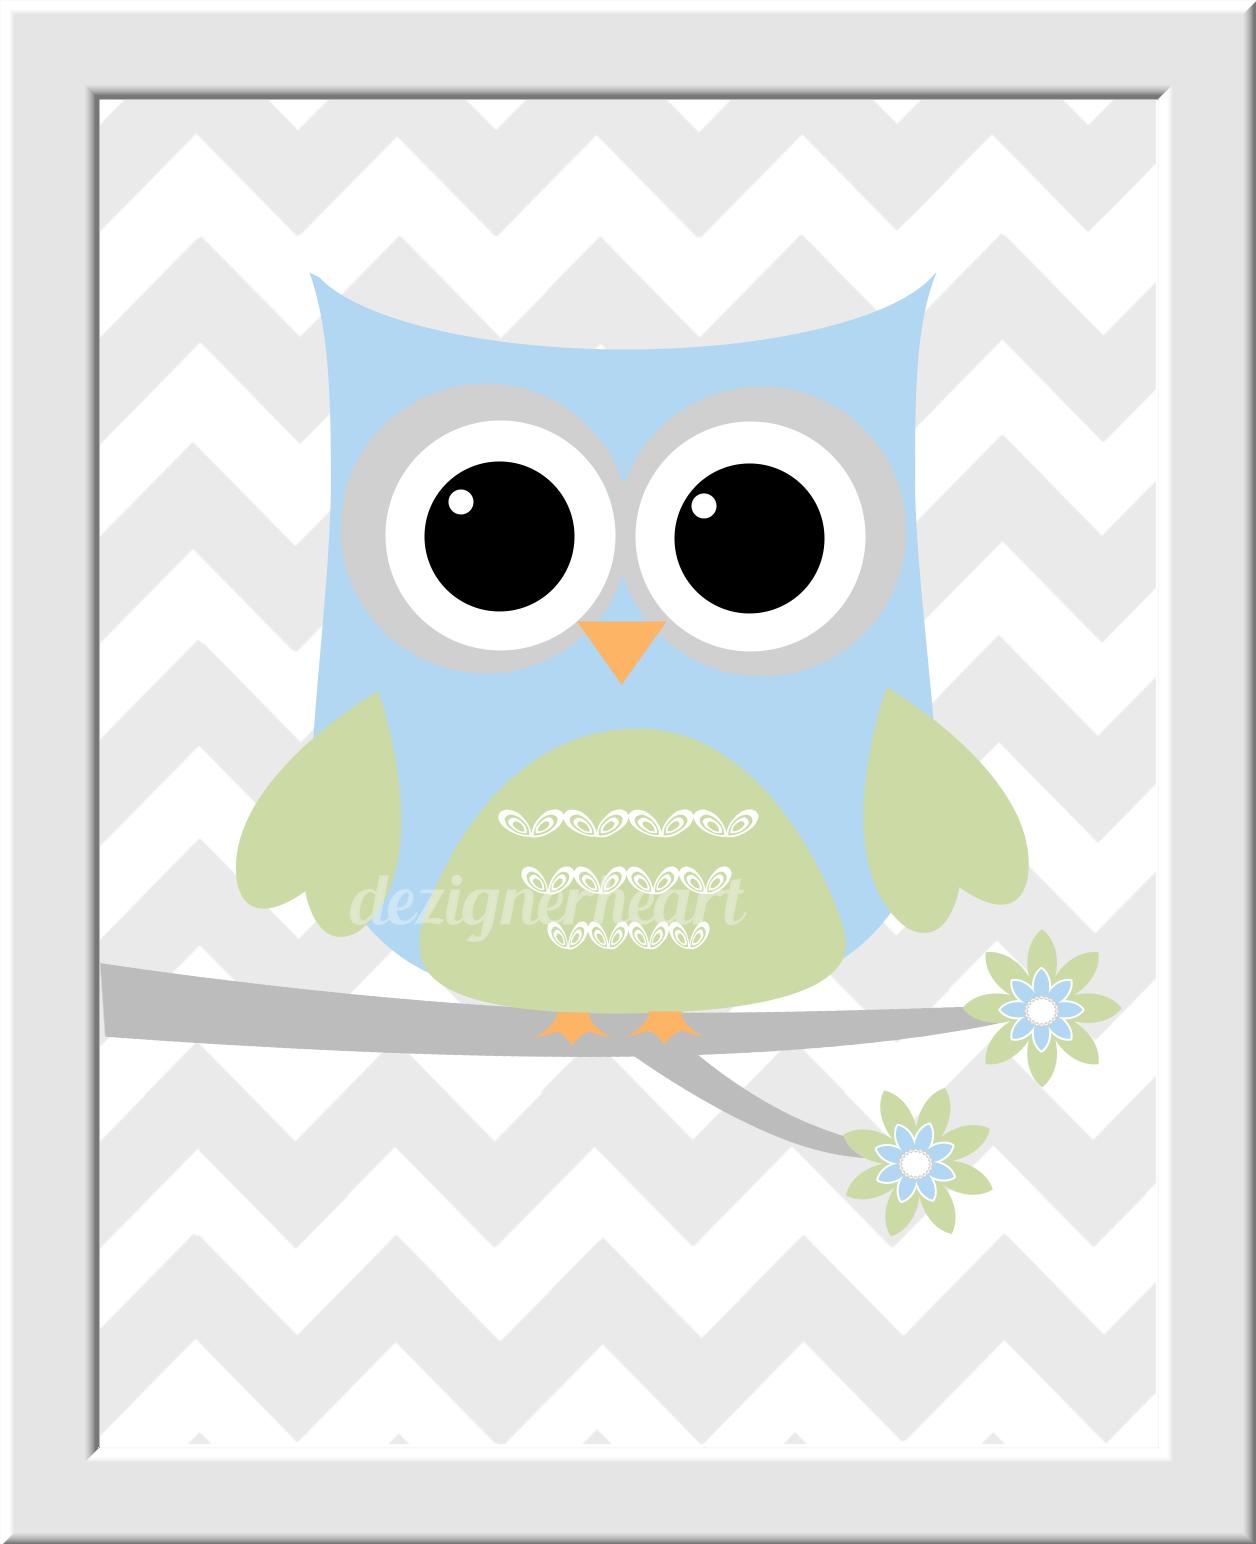 TWINS Baby Nursery Wall Art Baby Girl Baby Boy Owls Twice the Fun LOVE Baby Girl ...  sc 1 st  Dezignerheart Designs & TWINS Baby Nursery Wall Art Baby Girl Baby Boy Owls Twice the Fun ...